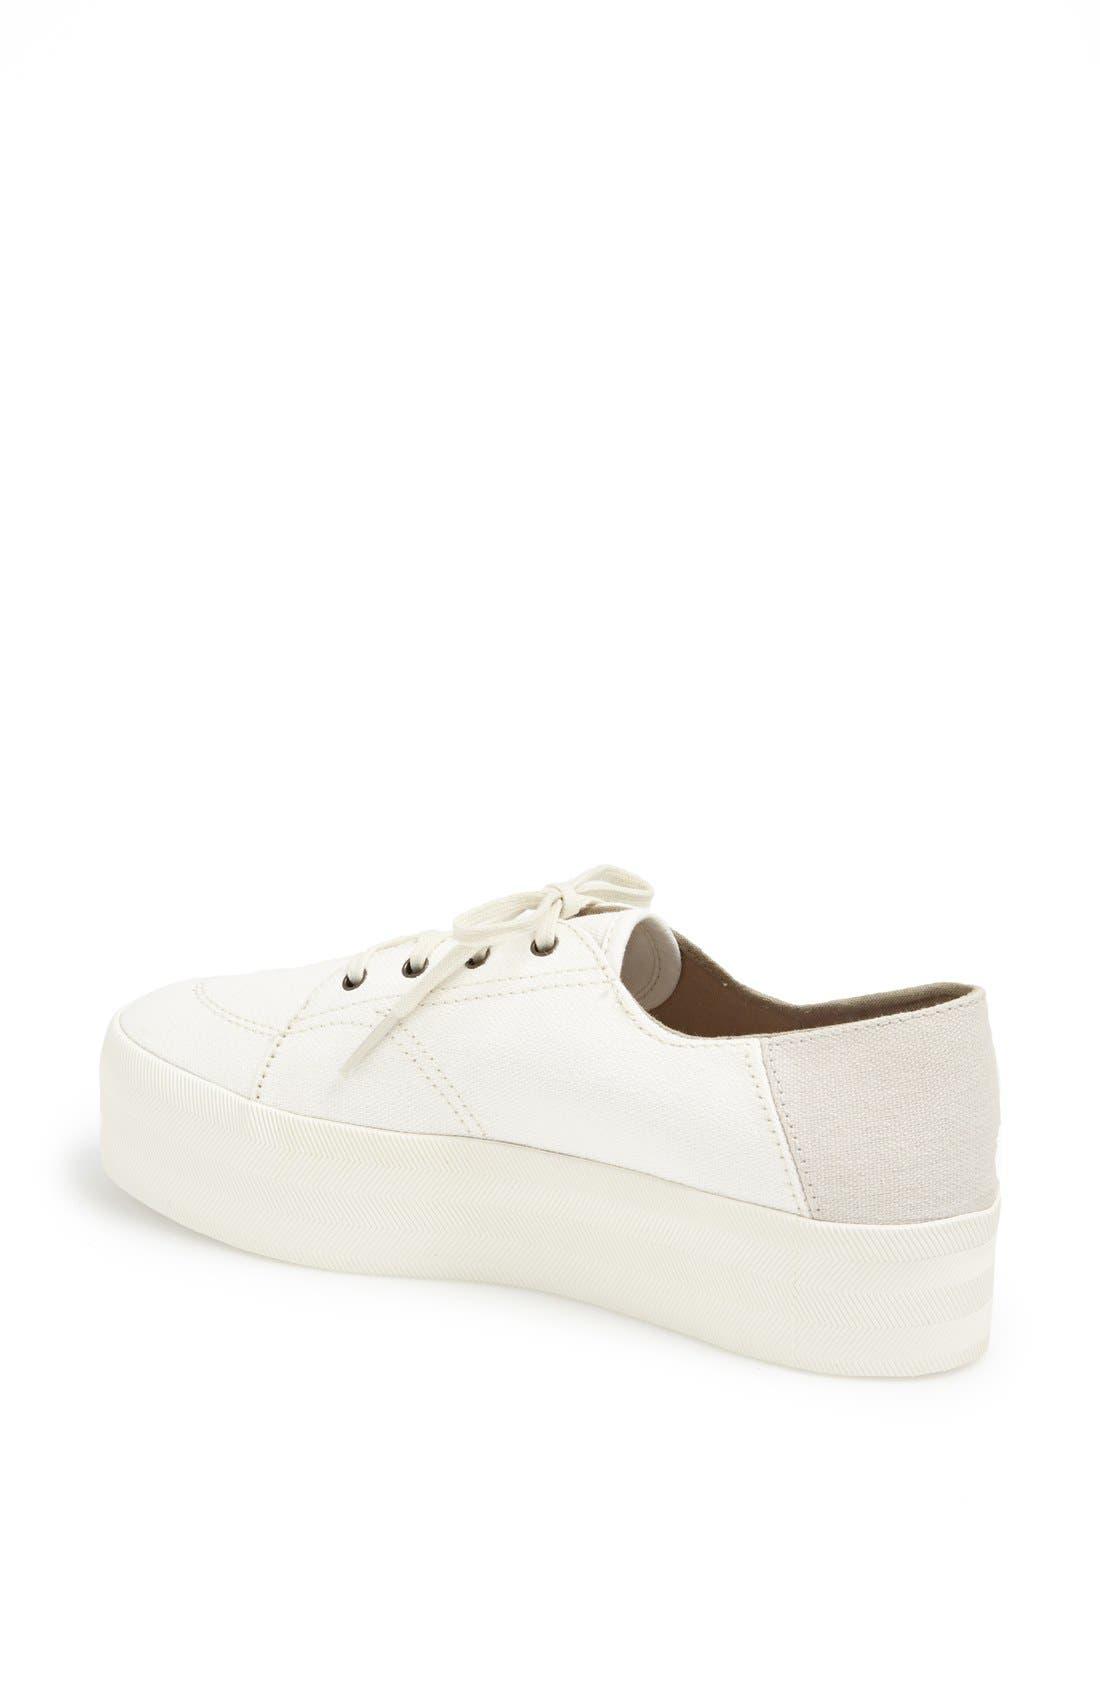 Alternate Image 2  - Lacoste 'Kirton' Platform Sneaker (Women) (Online Exclusive)